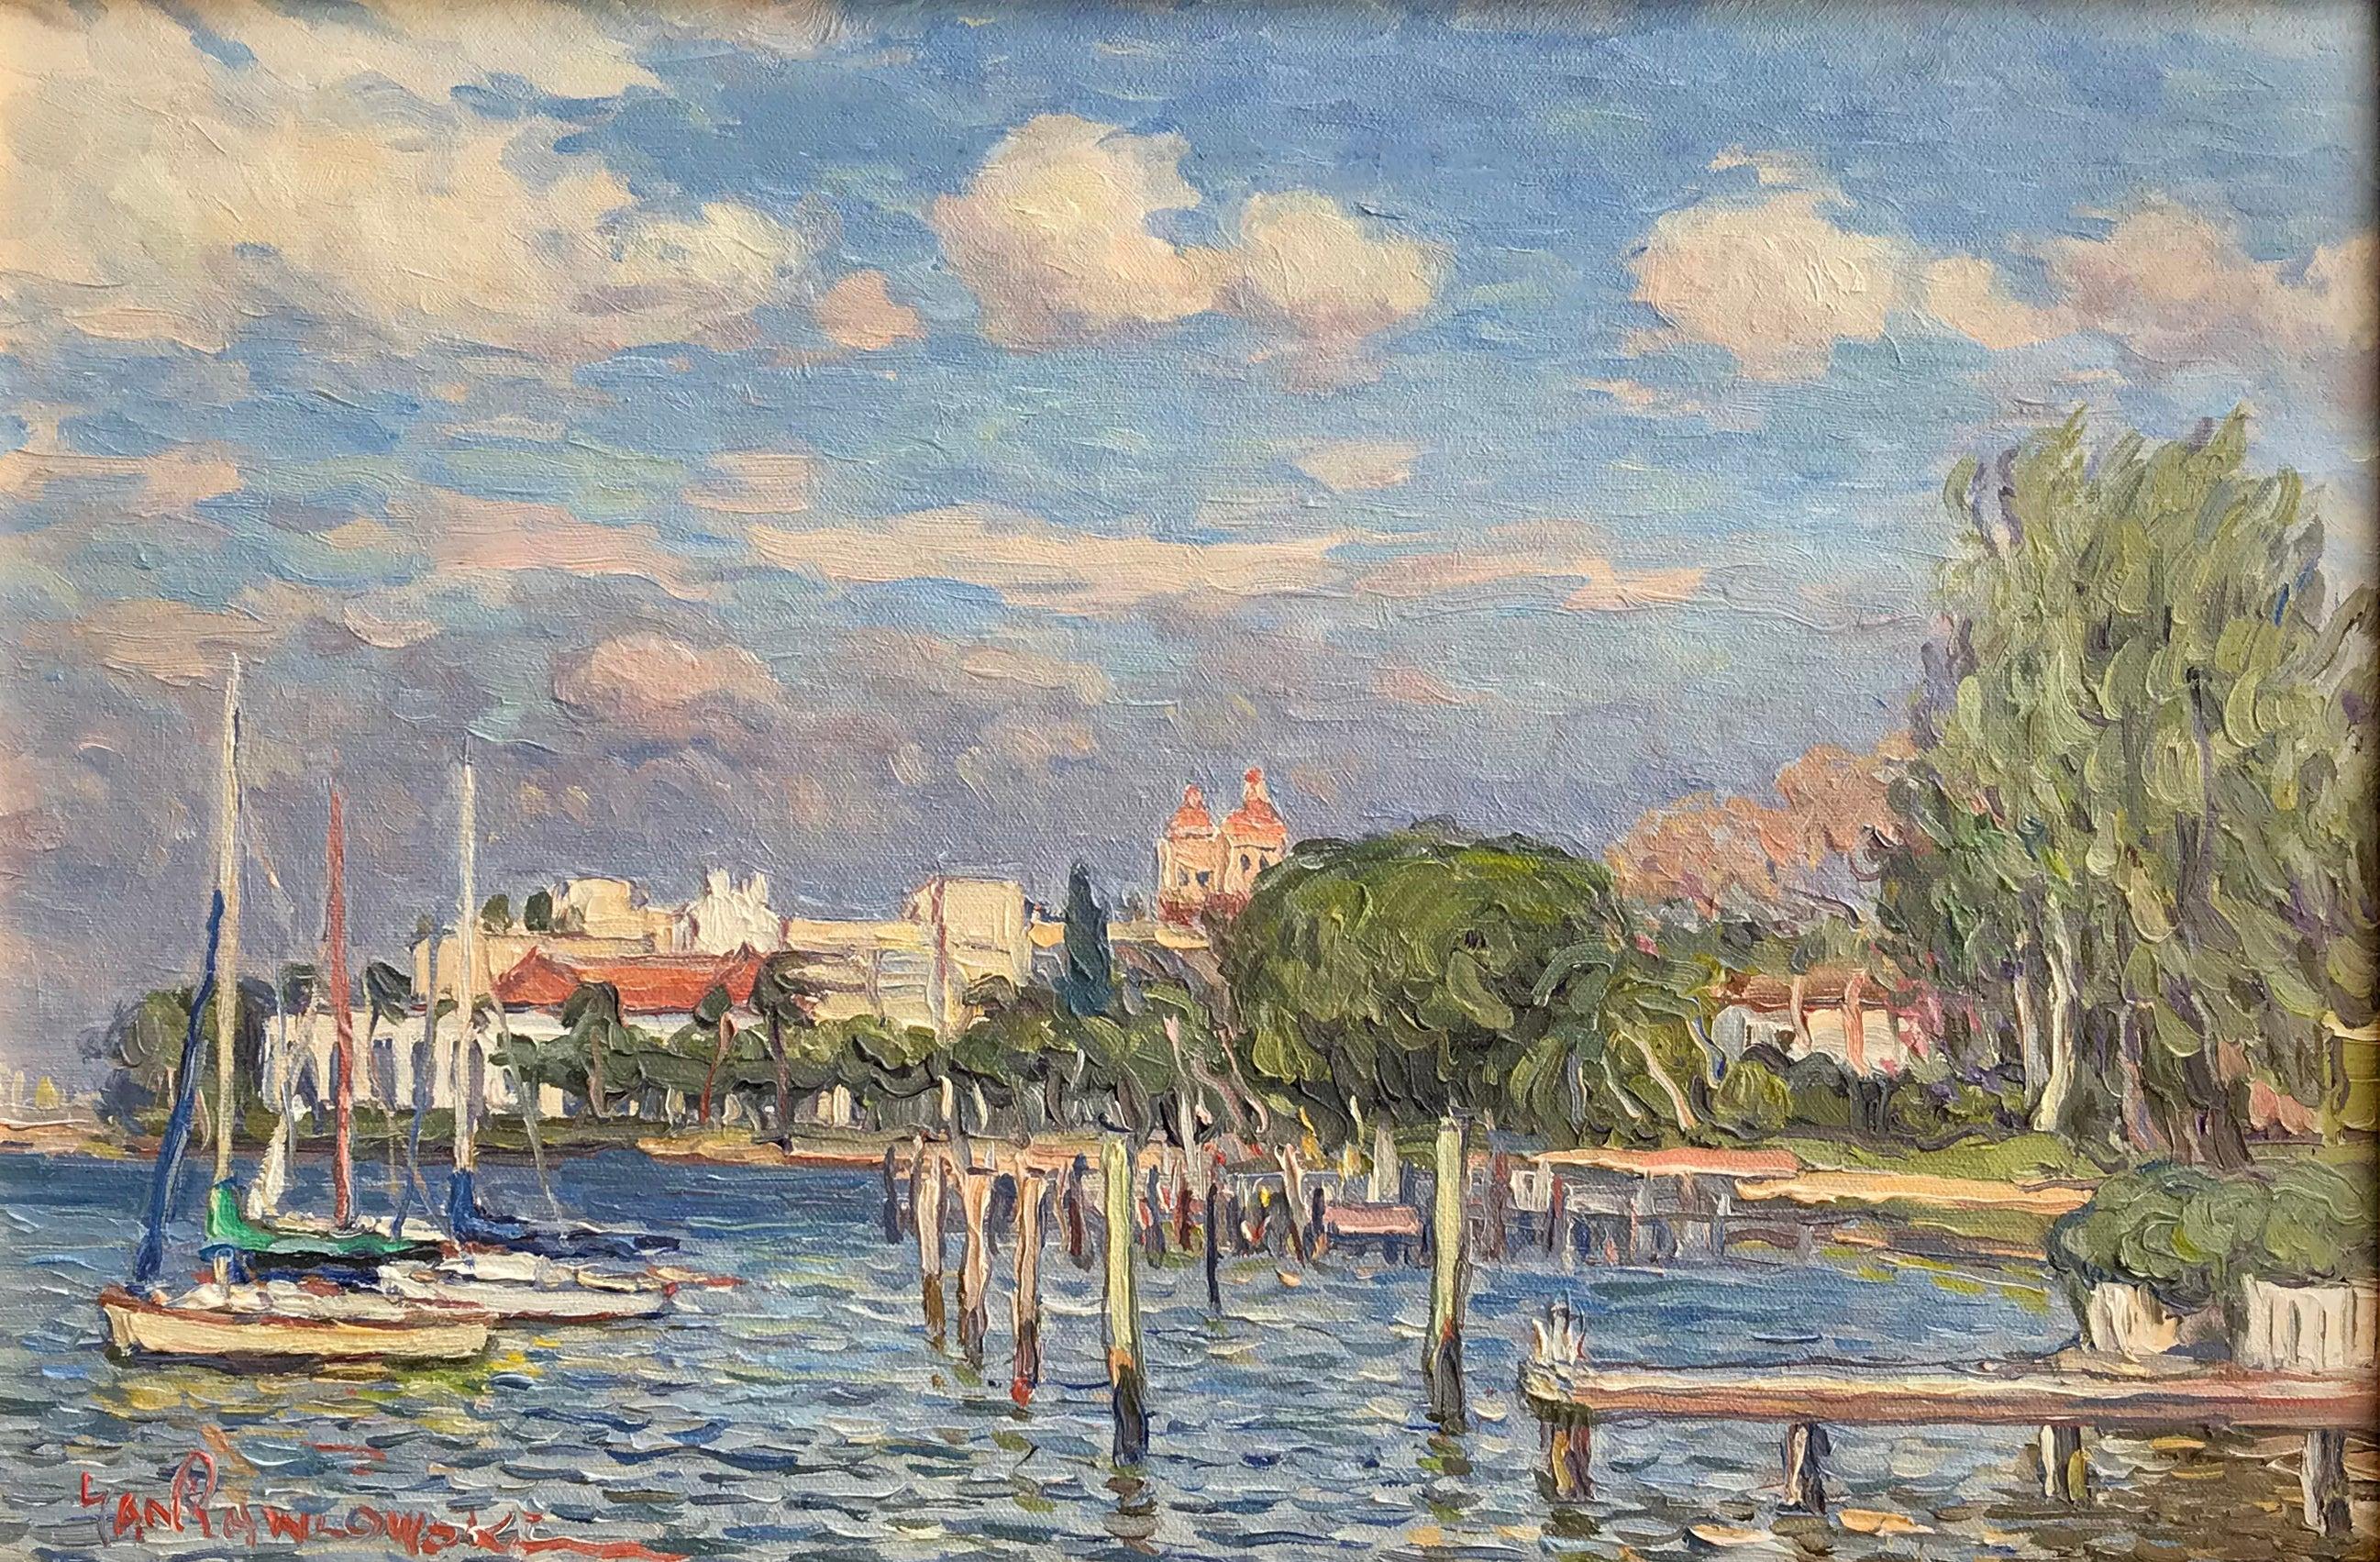 View from the Royal Palm Beach Bridge